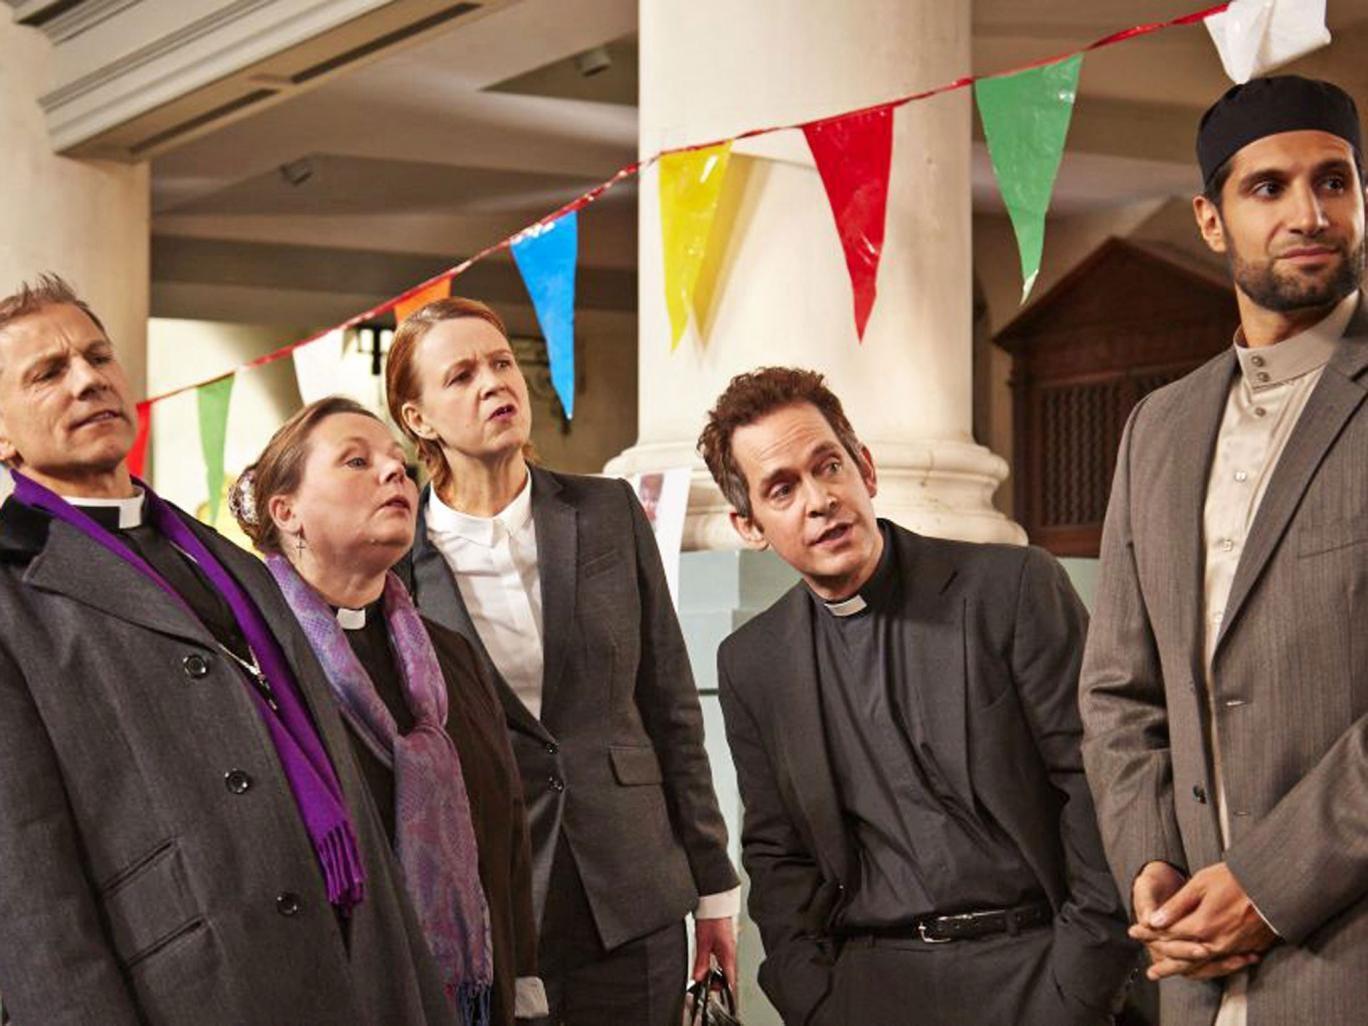 True collars: Simon McBurney, Joanna Scanlan, Vicki Pepperdine, Tom Hollander and Kayvan Novak in 'Rev'